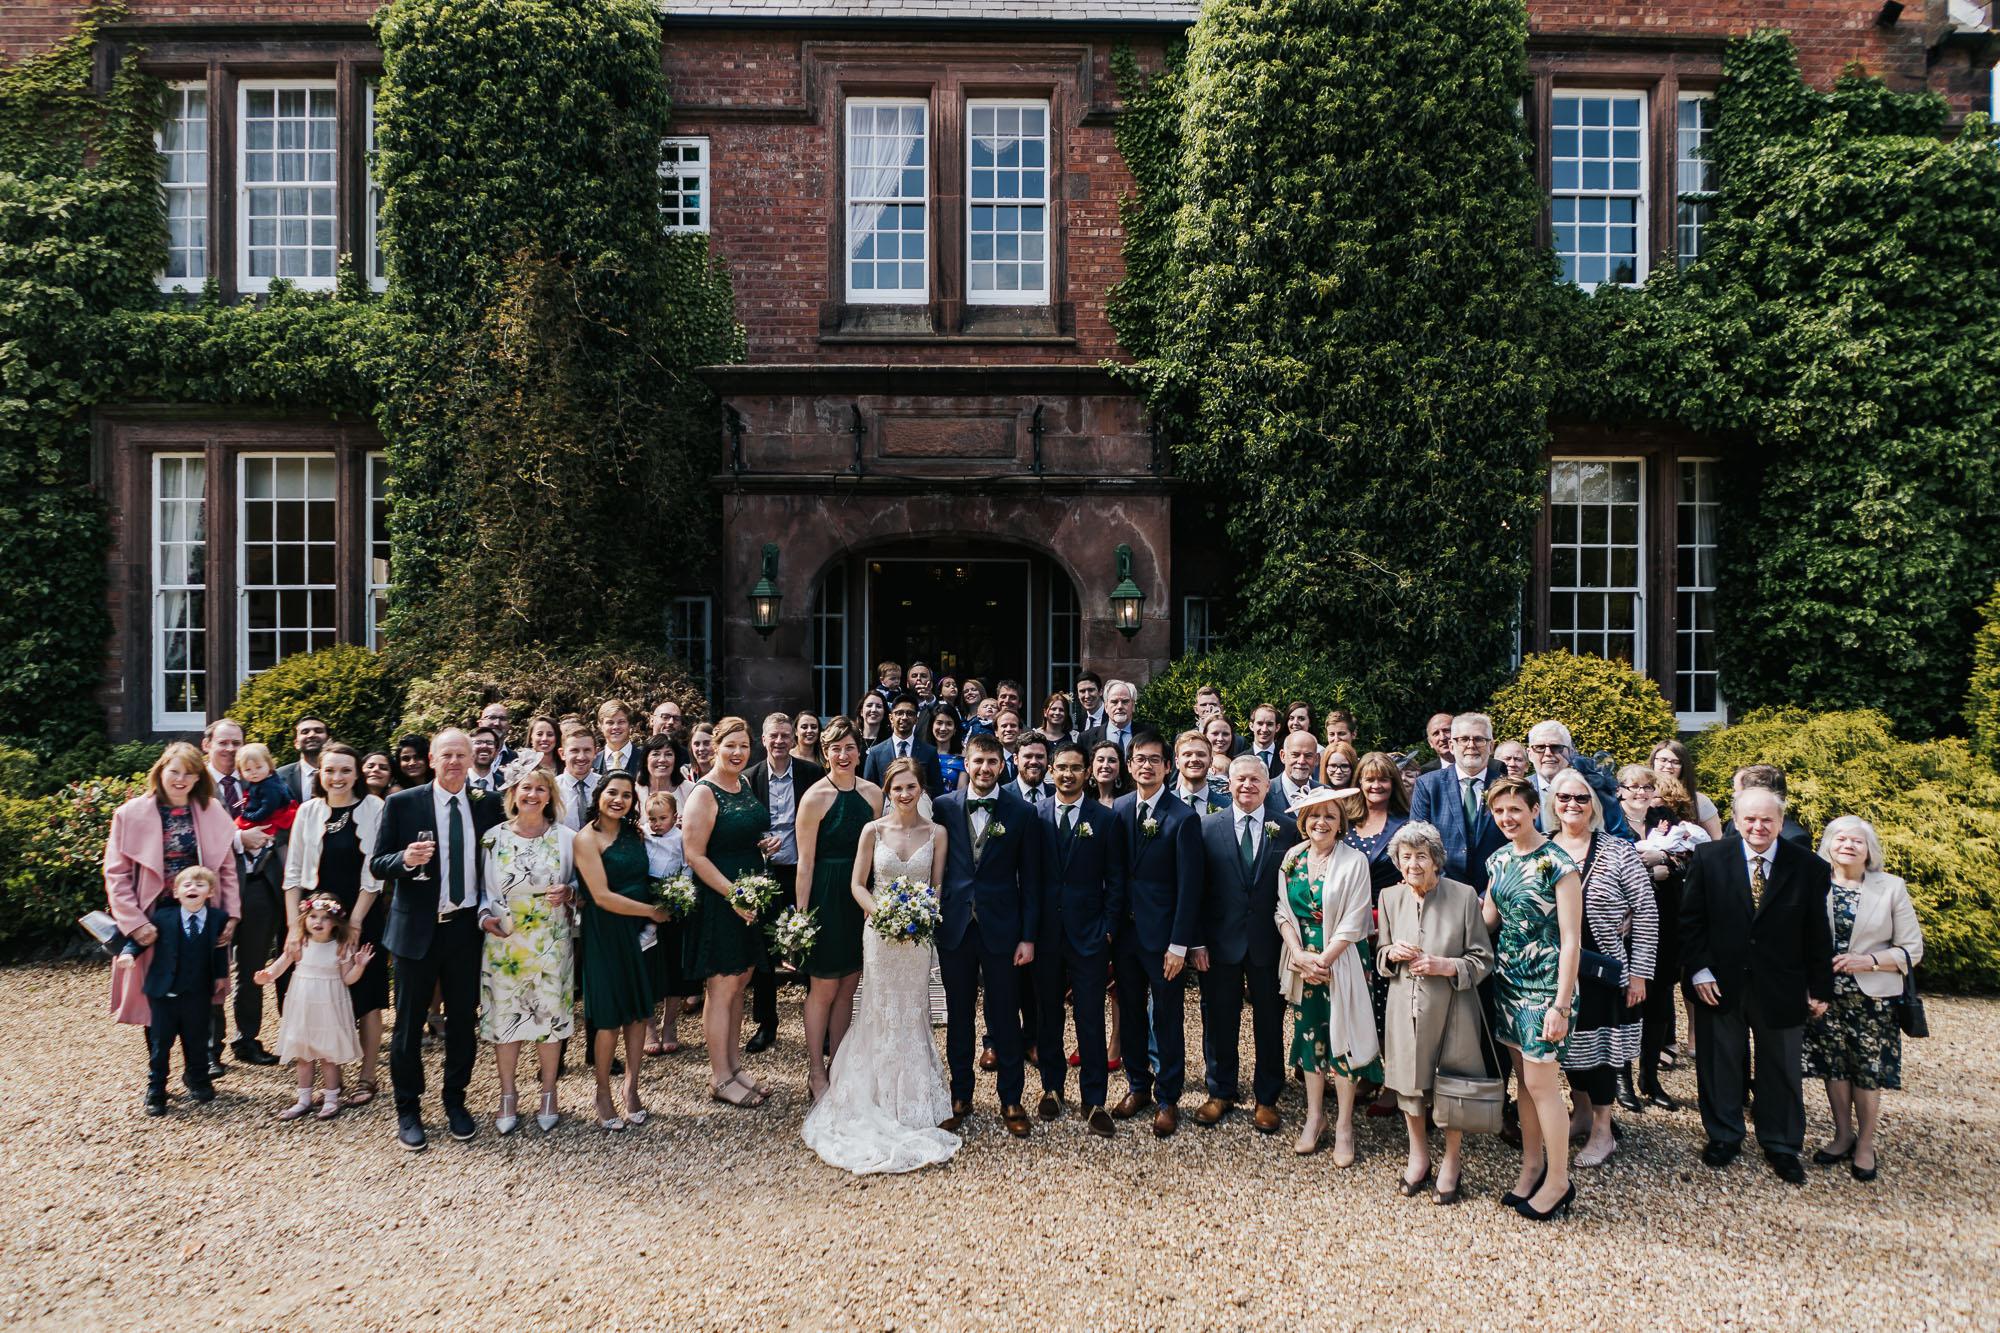 Nunsmere Hall Hotel Wedding photograhpy in cheshire wedding photographer (24 of 42).jpg